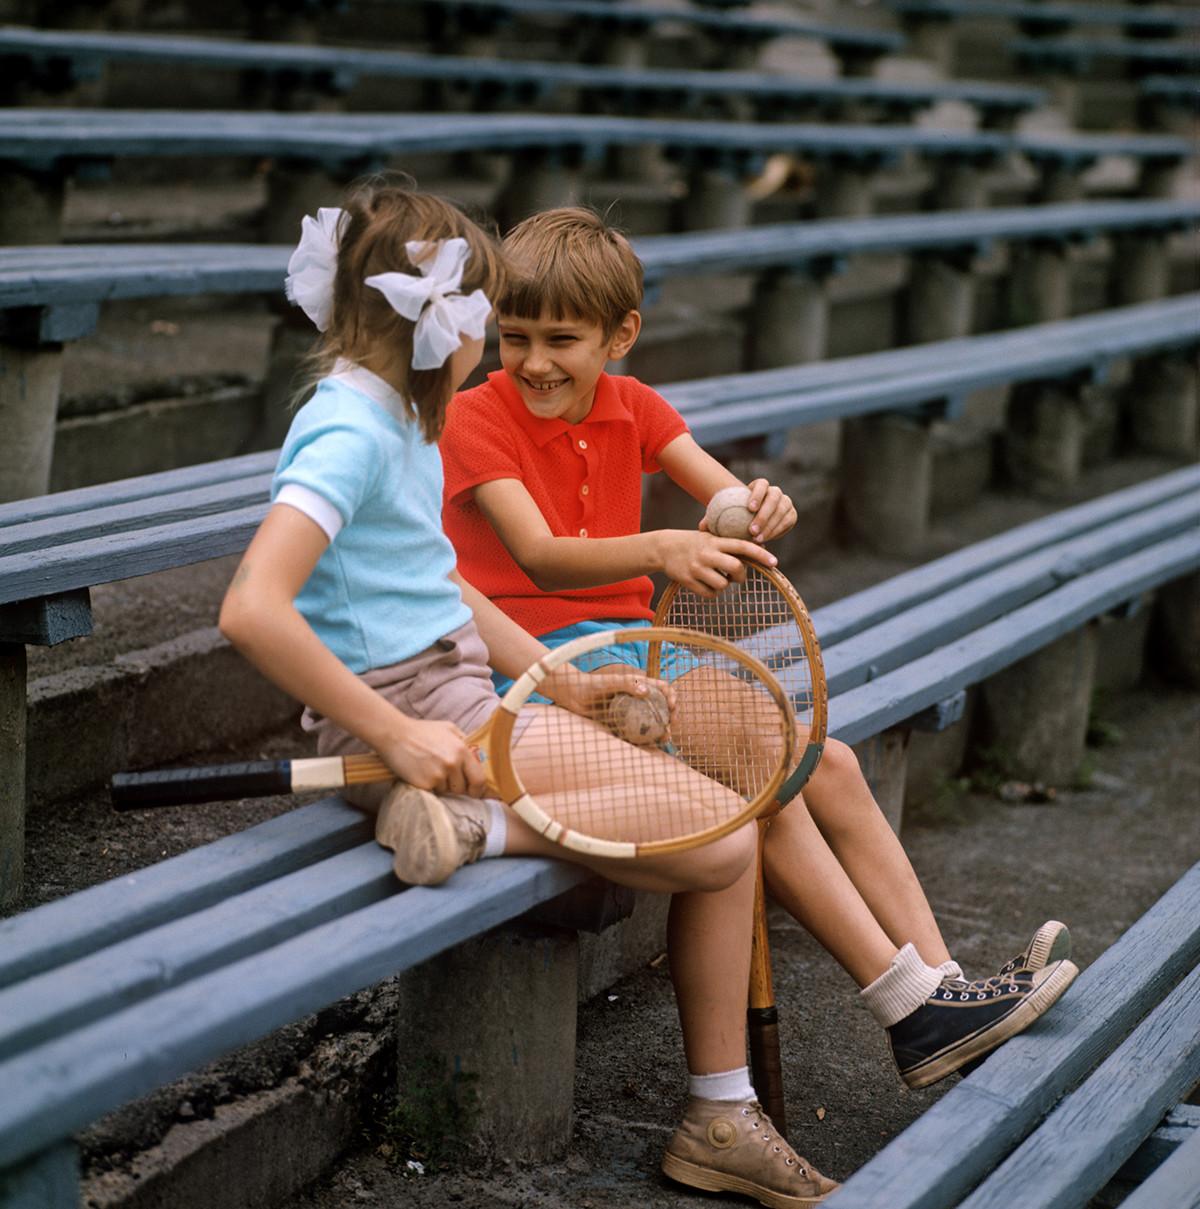 Classes at the children's tennis school of the Lokomotiv Sports Palace. Ukrainian SSR